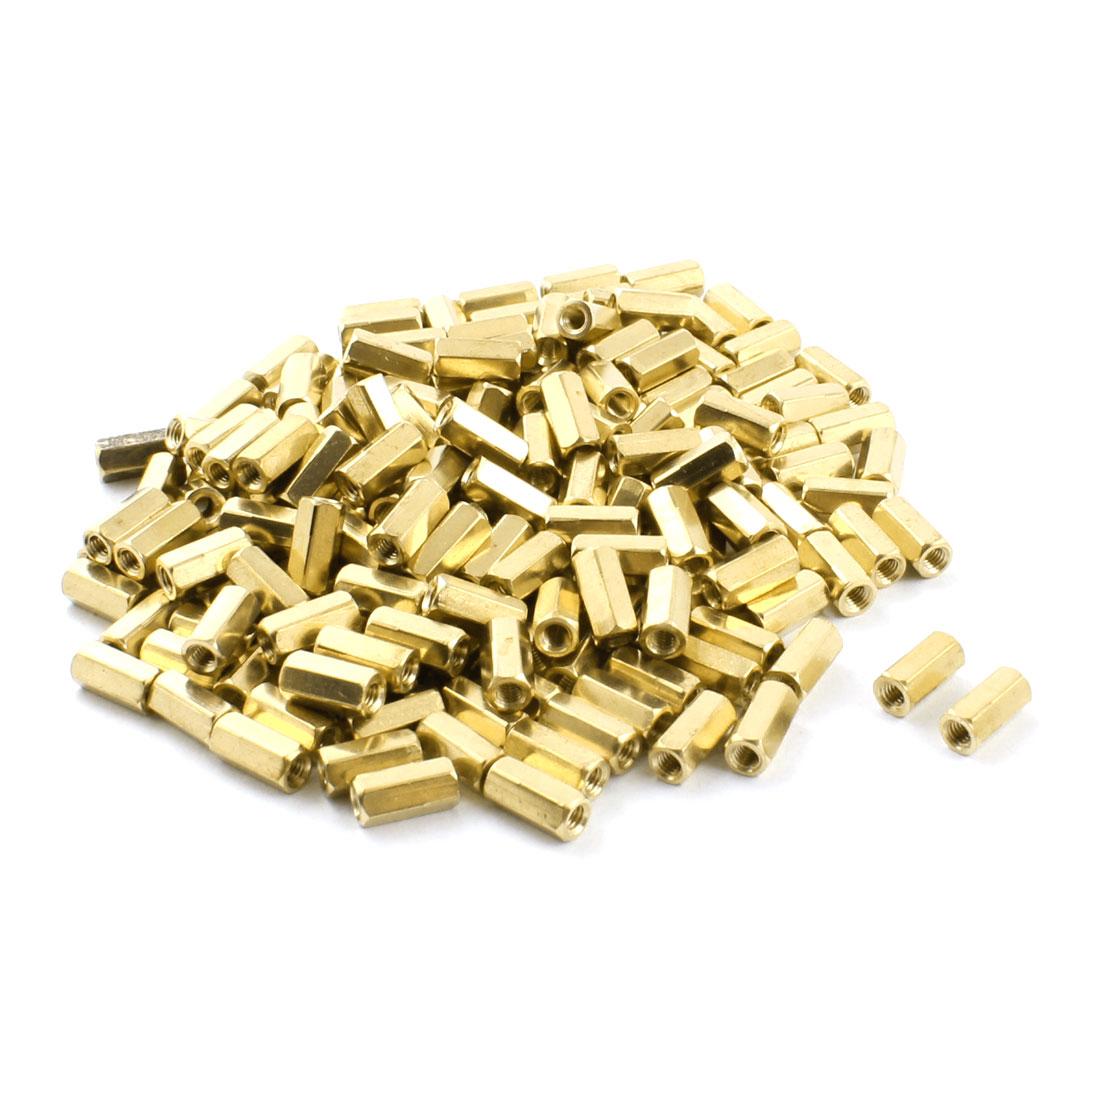 200Pcs M3 x 10mm Female Thread Gold Tone Brass Nut PCB Hexagonal Nut Standoff Spacer